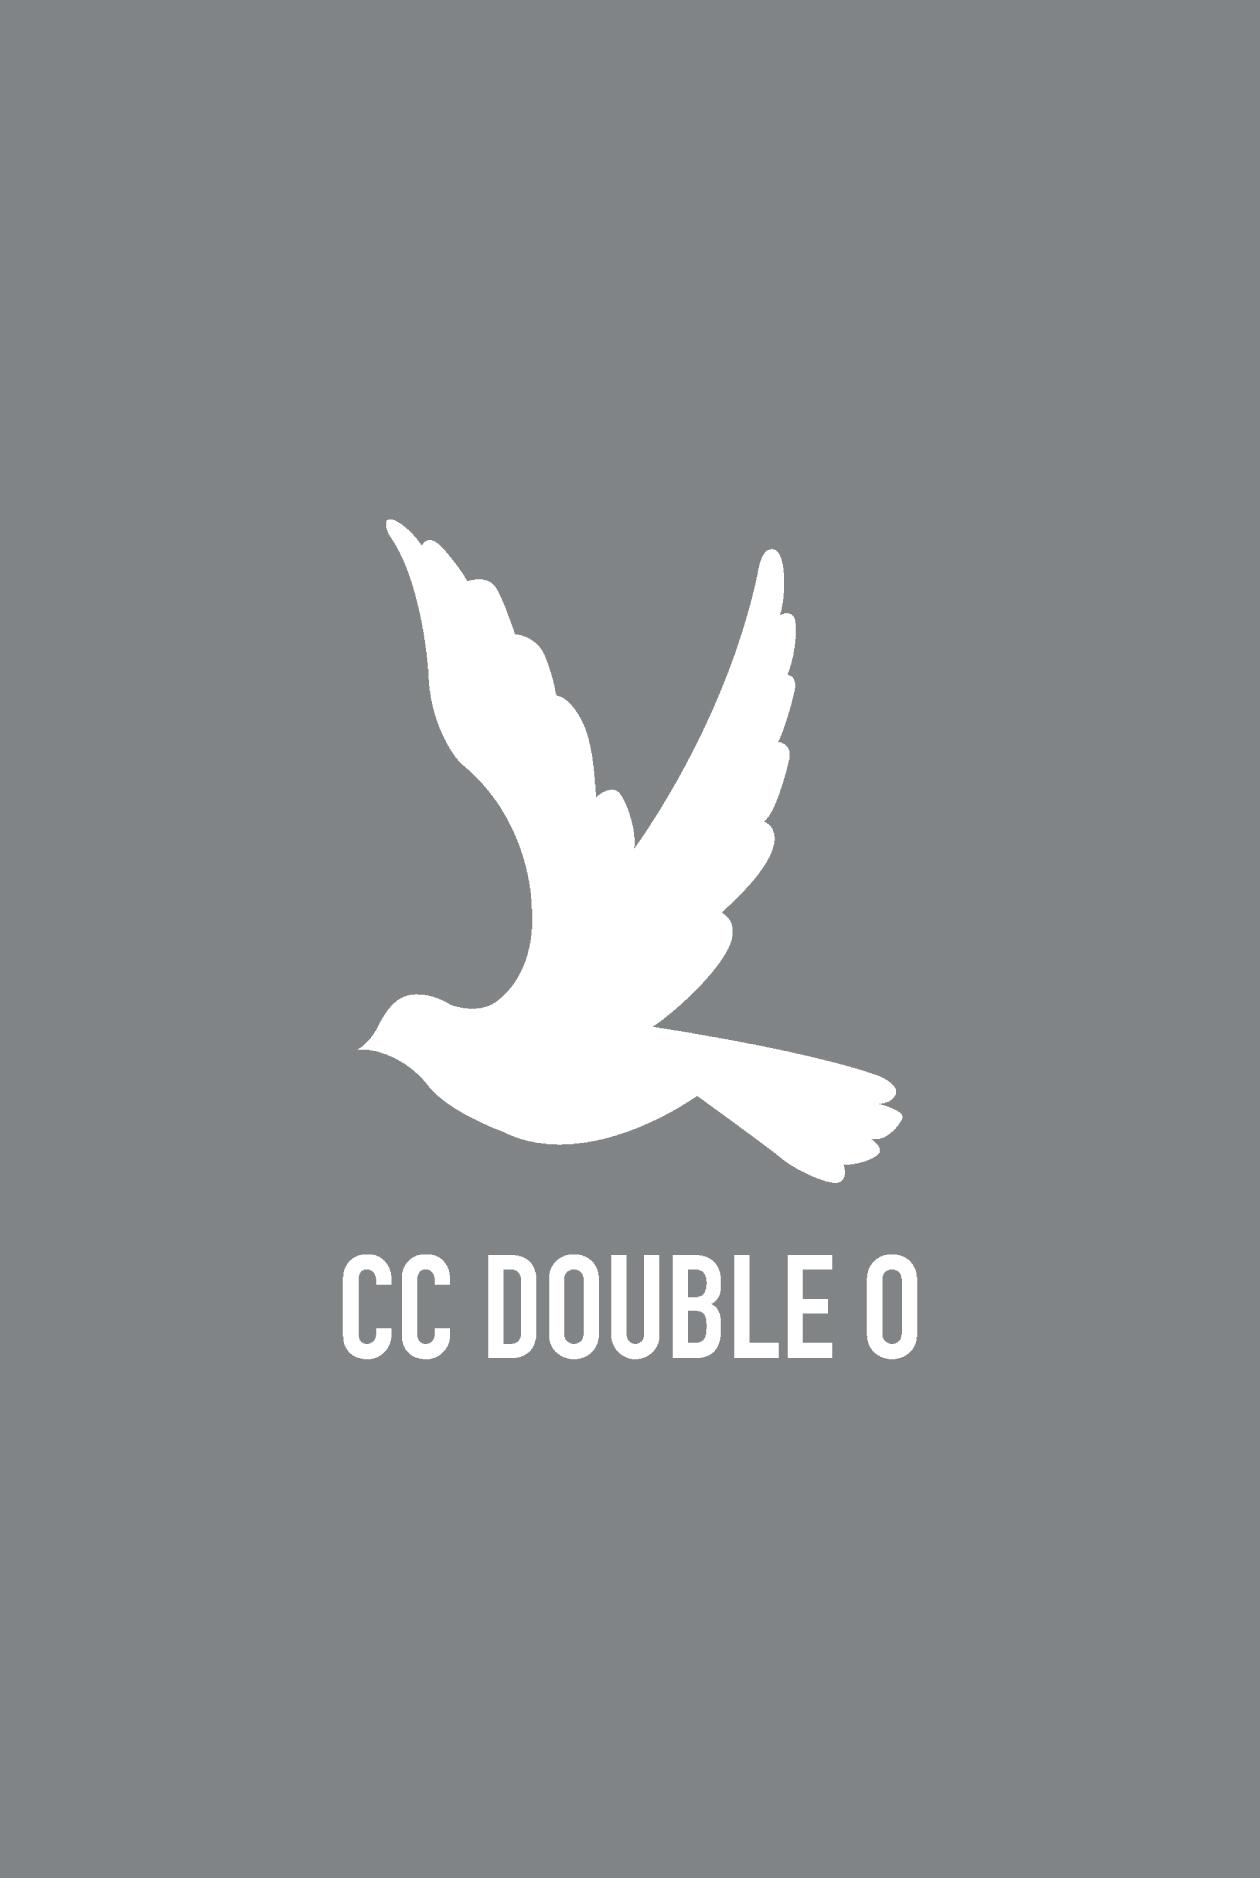 CC DOUBLE O V-Neck Tee